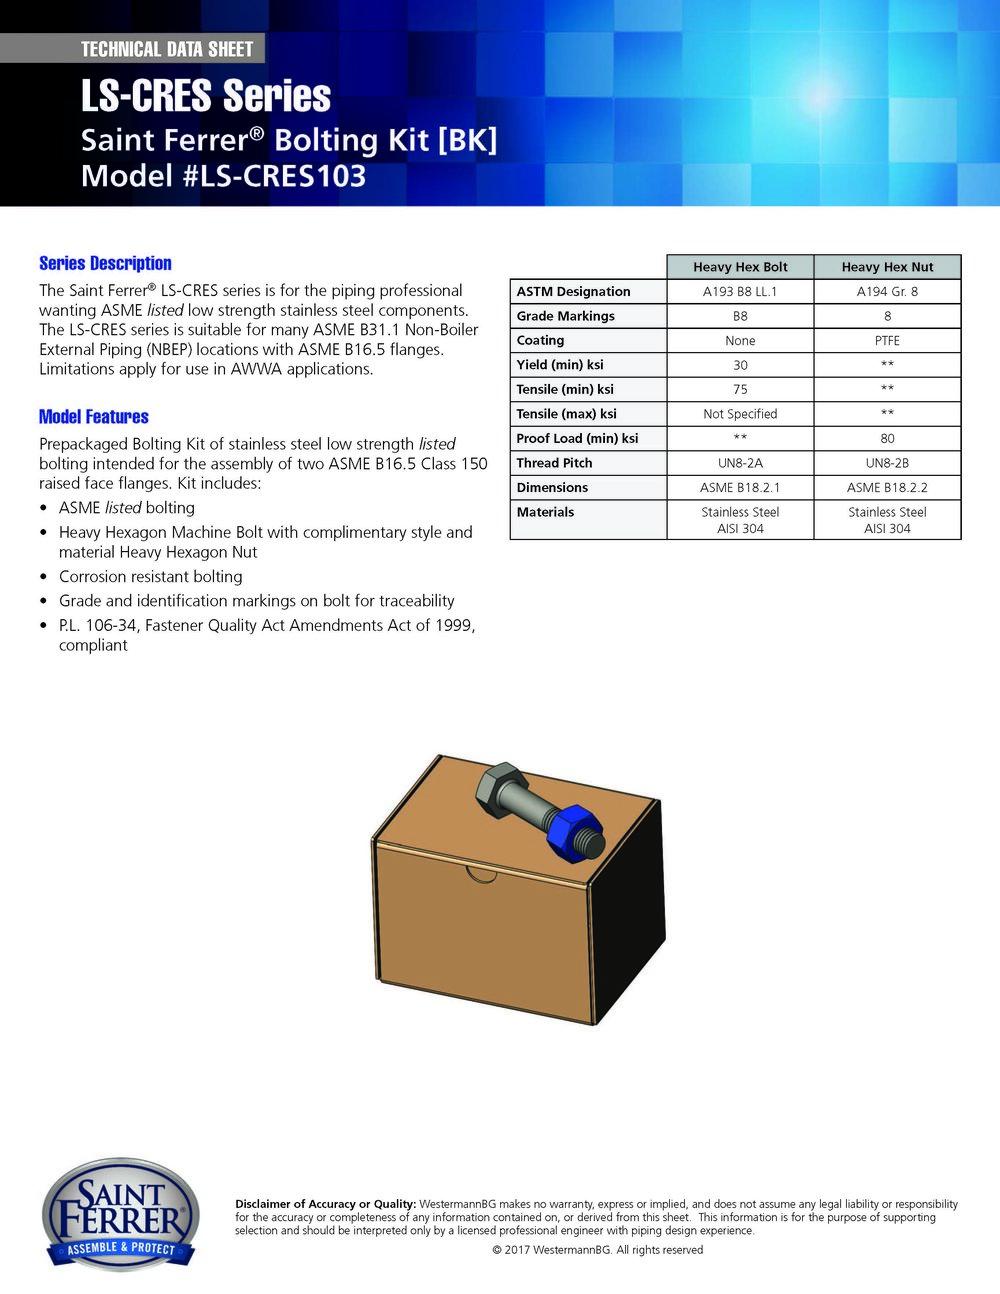 SF_Data_Sheet_LS-CRES_Series_LS-CRES103.jpg